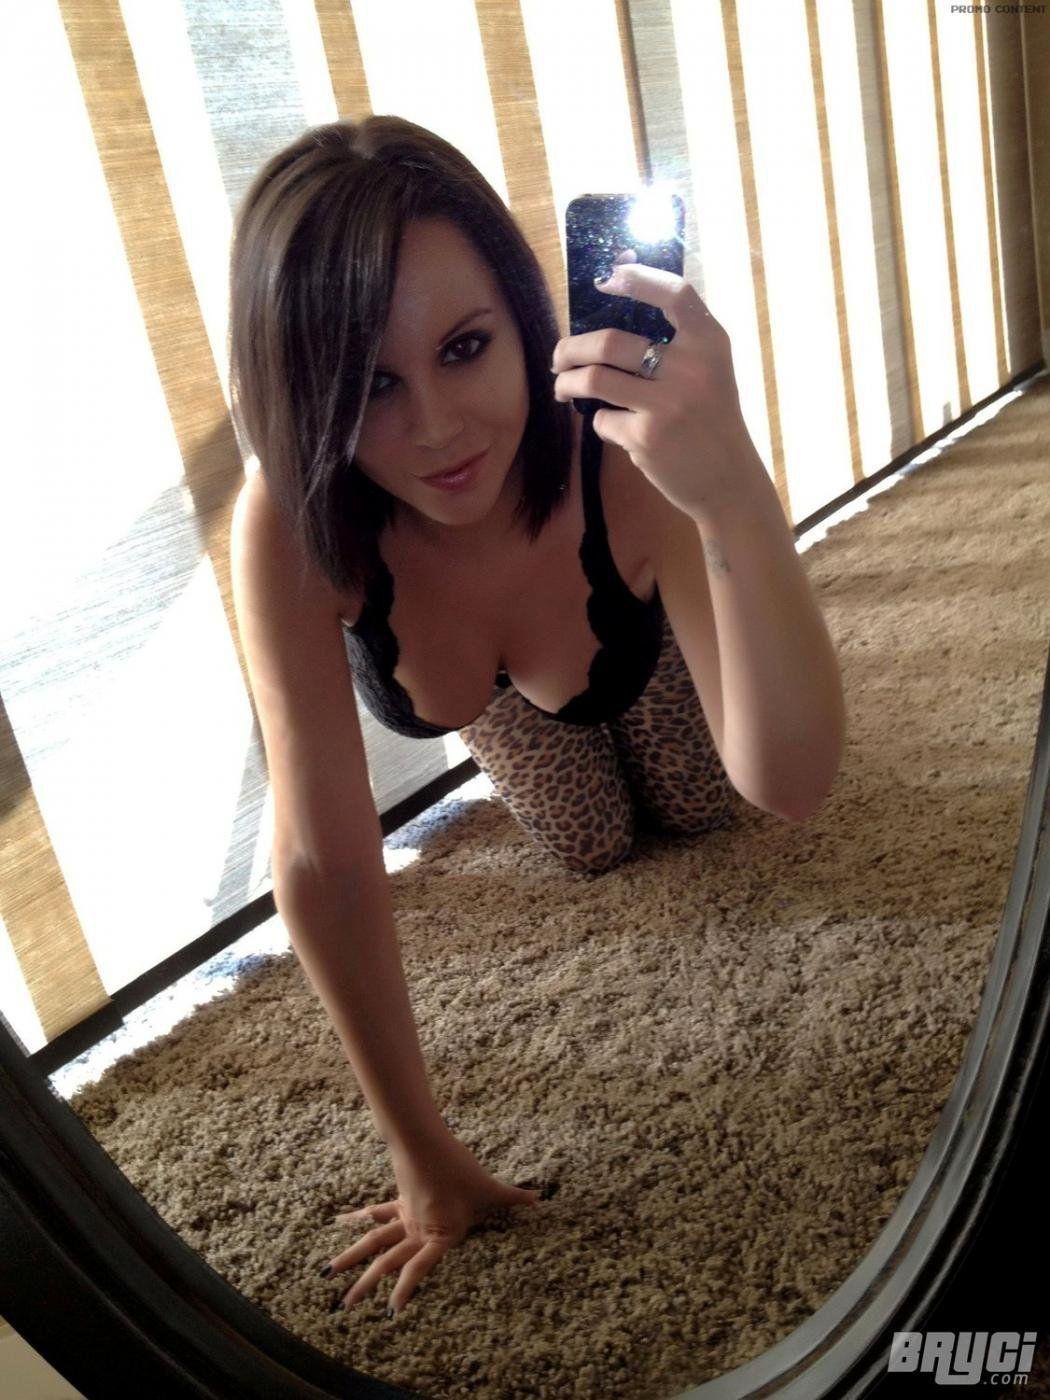 hot women #hottest women #hot naked women #hot nude women #hot sexy